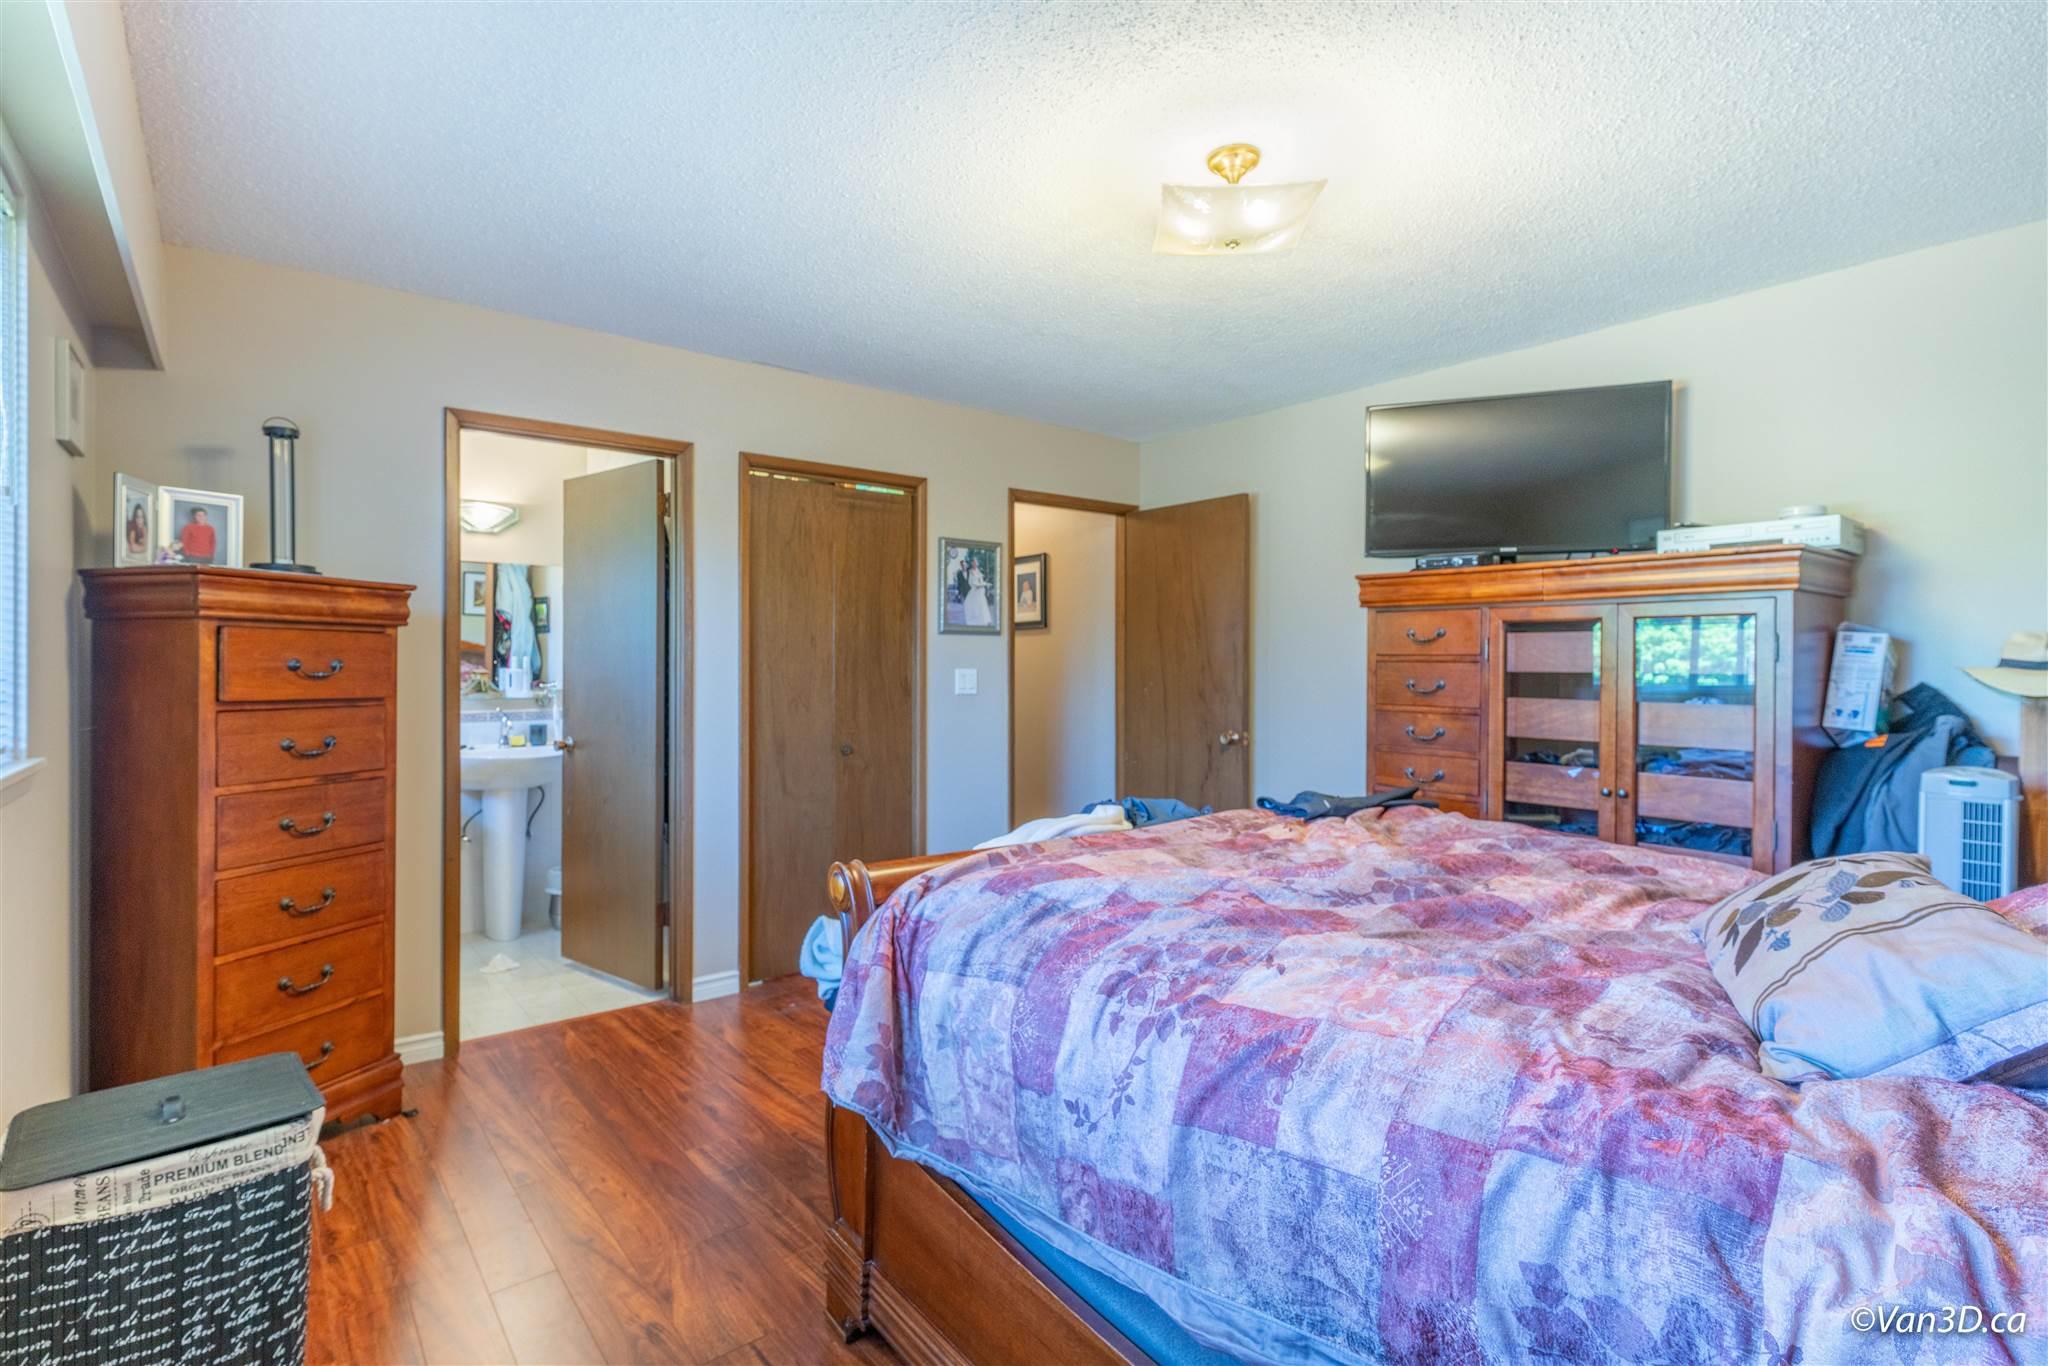 14495 MANN PARK CRESCENT - White Rock House/Single Family for sale, 4 Bedrooms (R2604561) - #14